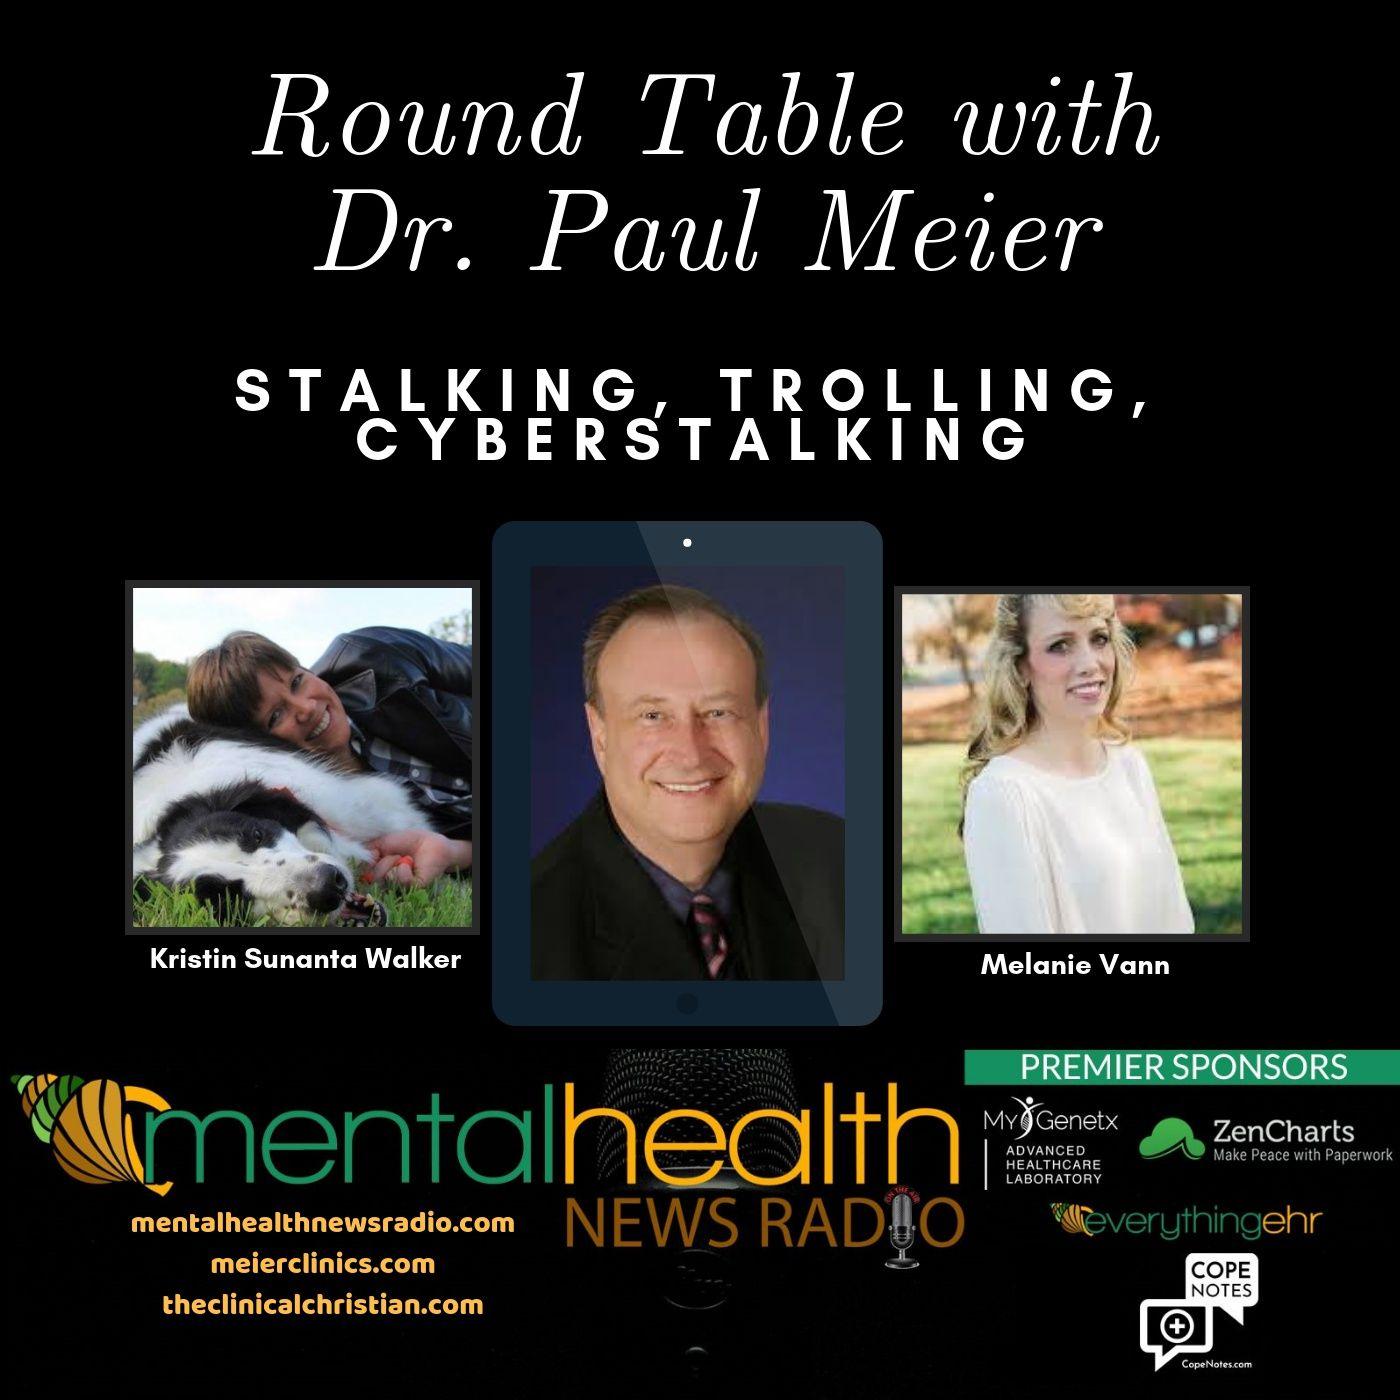 Mental Health News Radio - Round Table Dr. Paul Meier: Stalking, Trolling, Cyberstalking